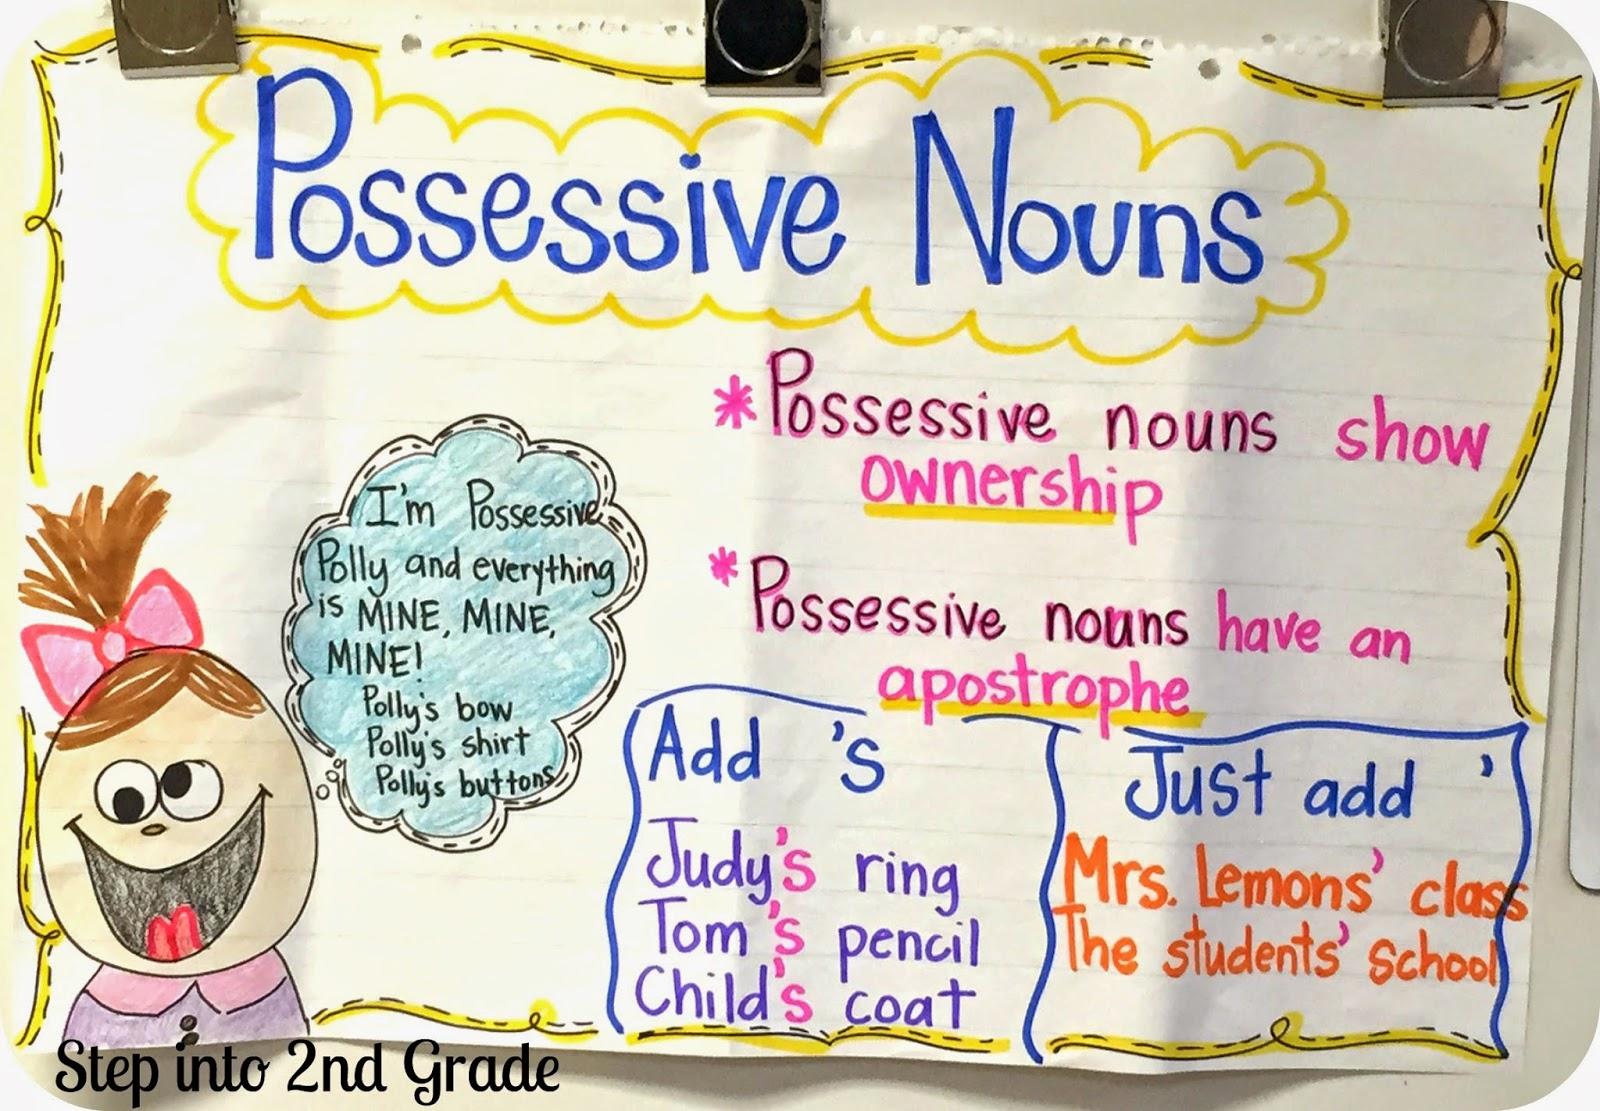 Possessive Nouns | Step into 2nd Grade with Mrs  Lemons | Bloglovin'